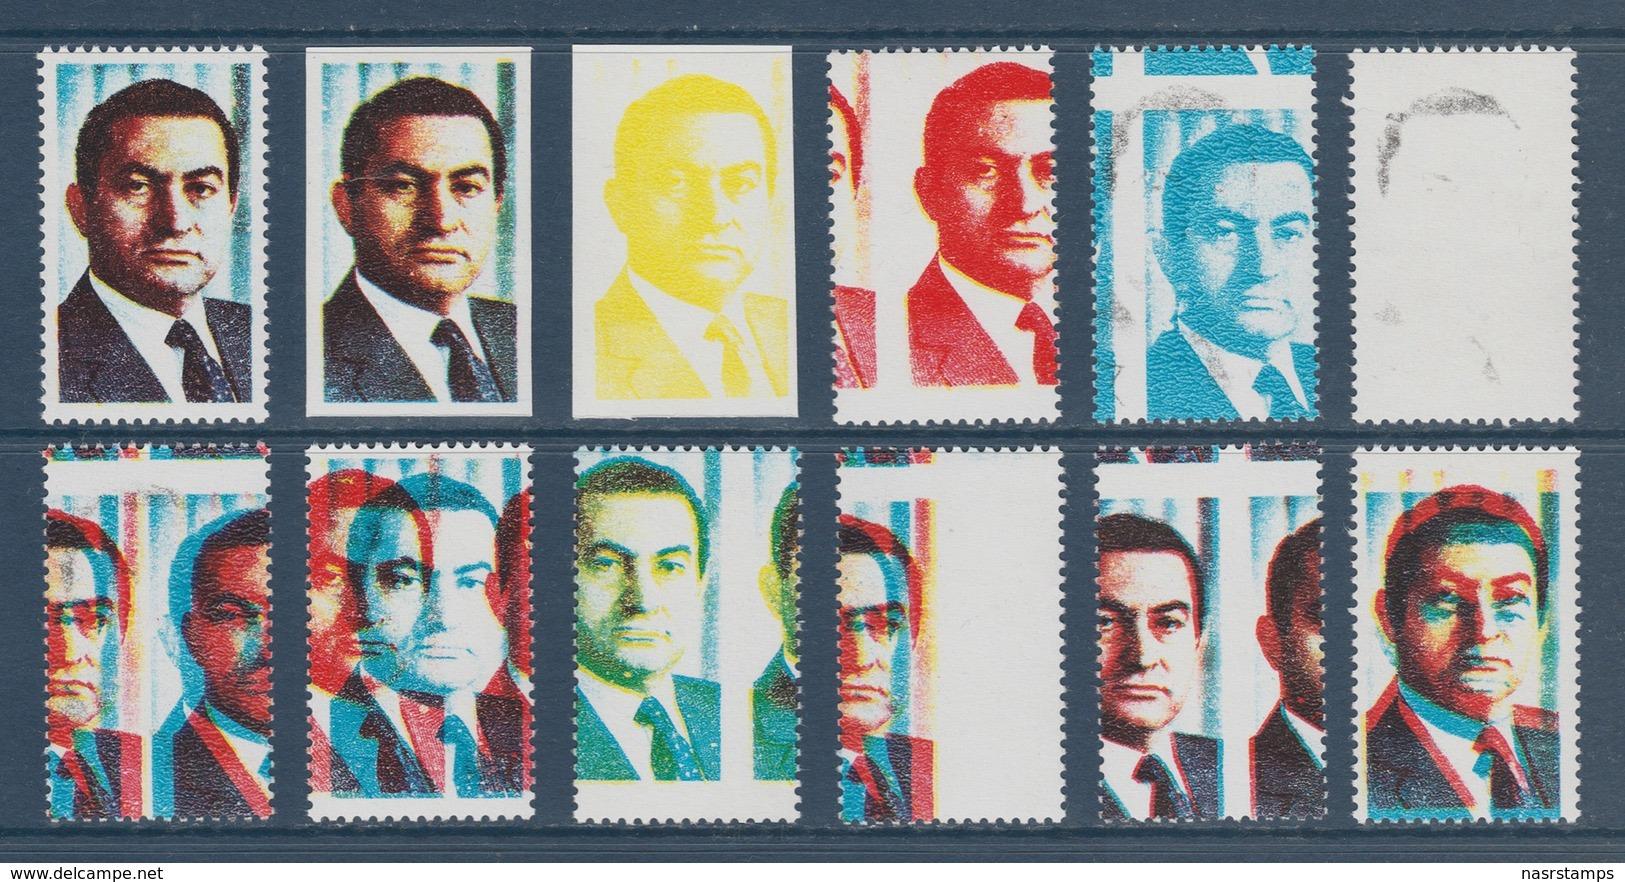 Egypt - Essays - Very Rare - ( Ex President Hosni MUBARAK, Egypt - Missperf., Pair - Proofs ) - MNH** - See Description - Egypt